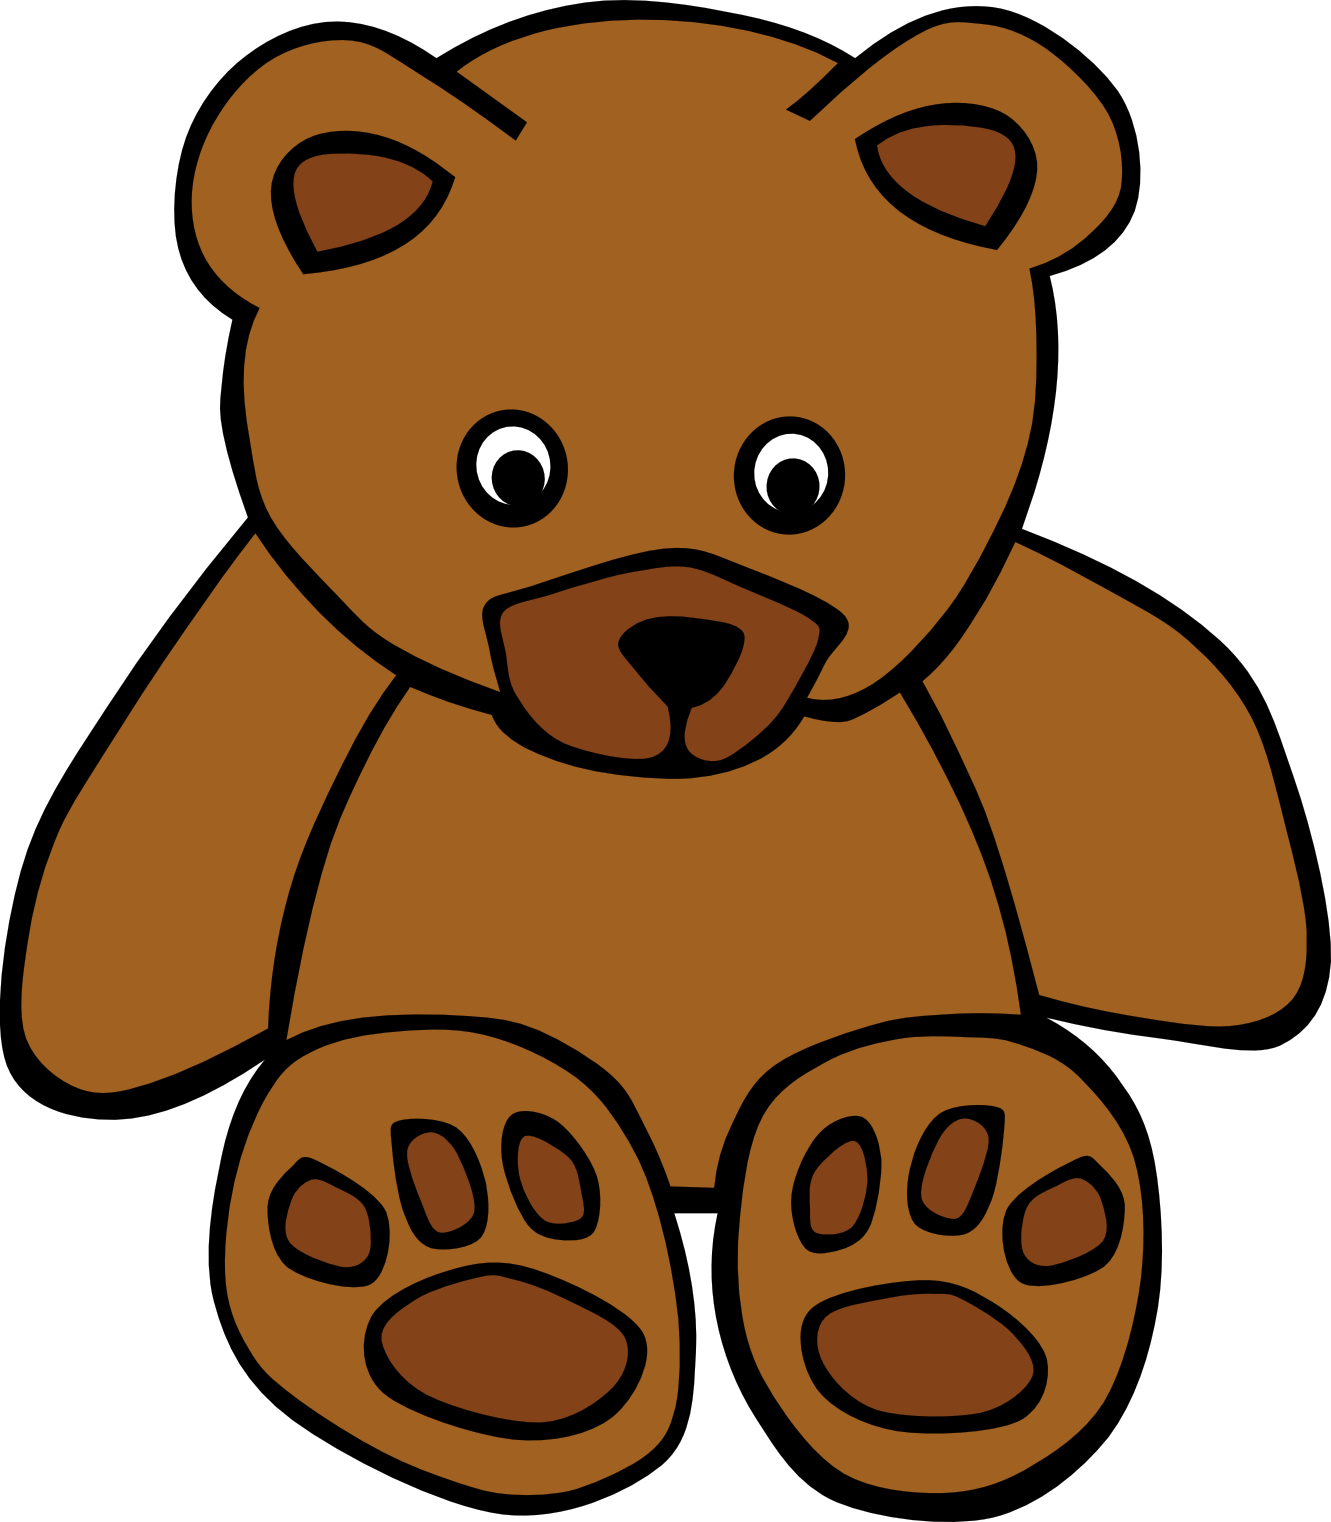 1331x1522 Stuffed Animal Clipart Carton